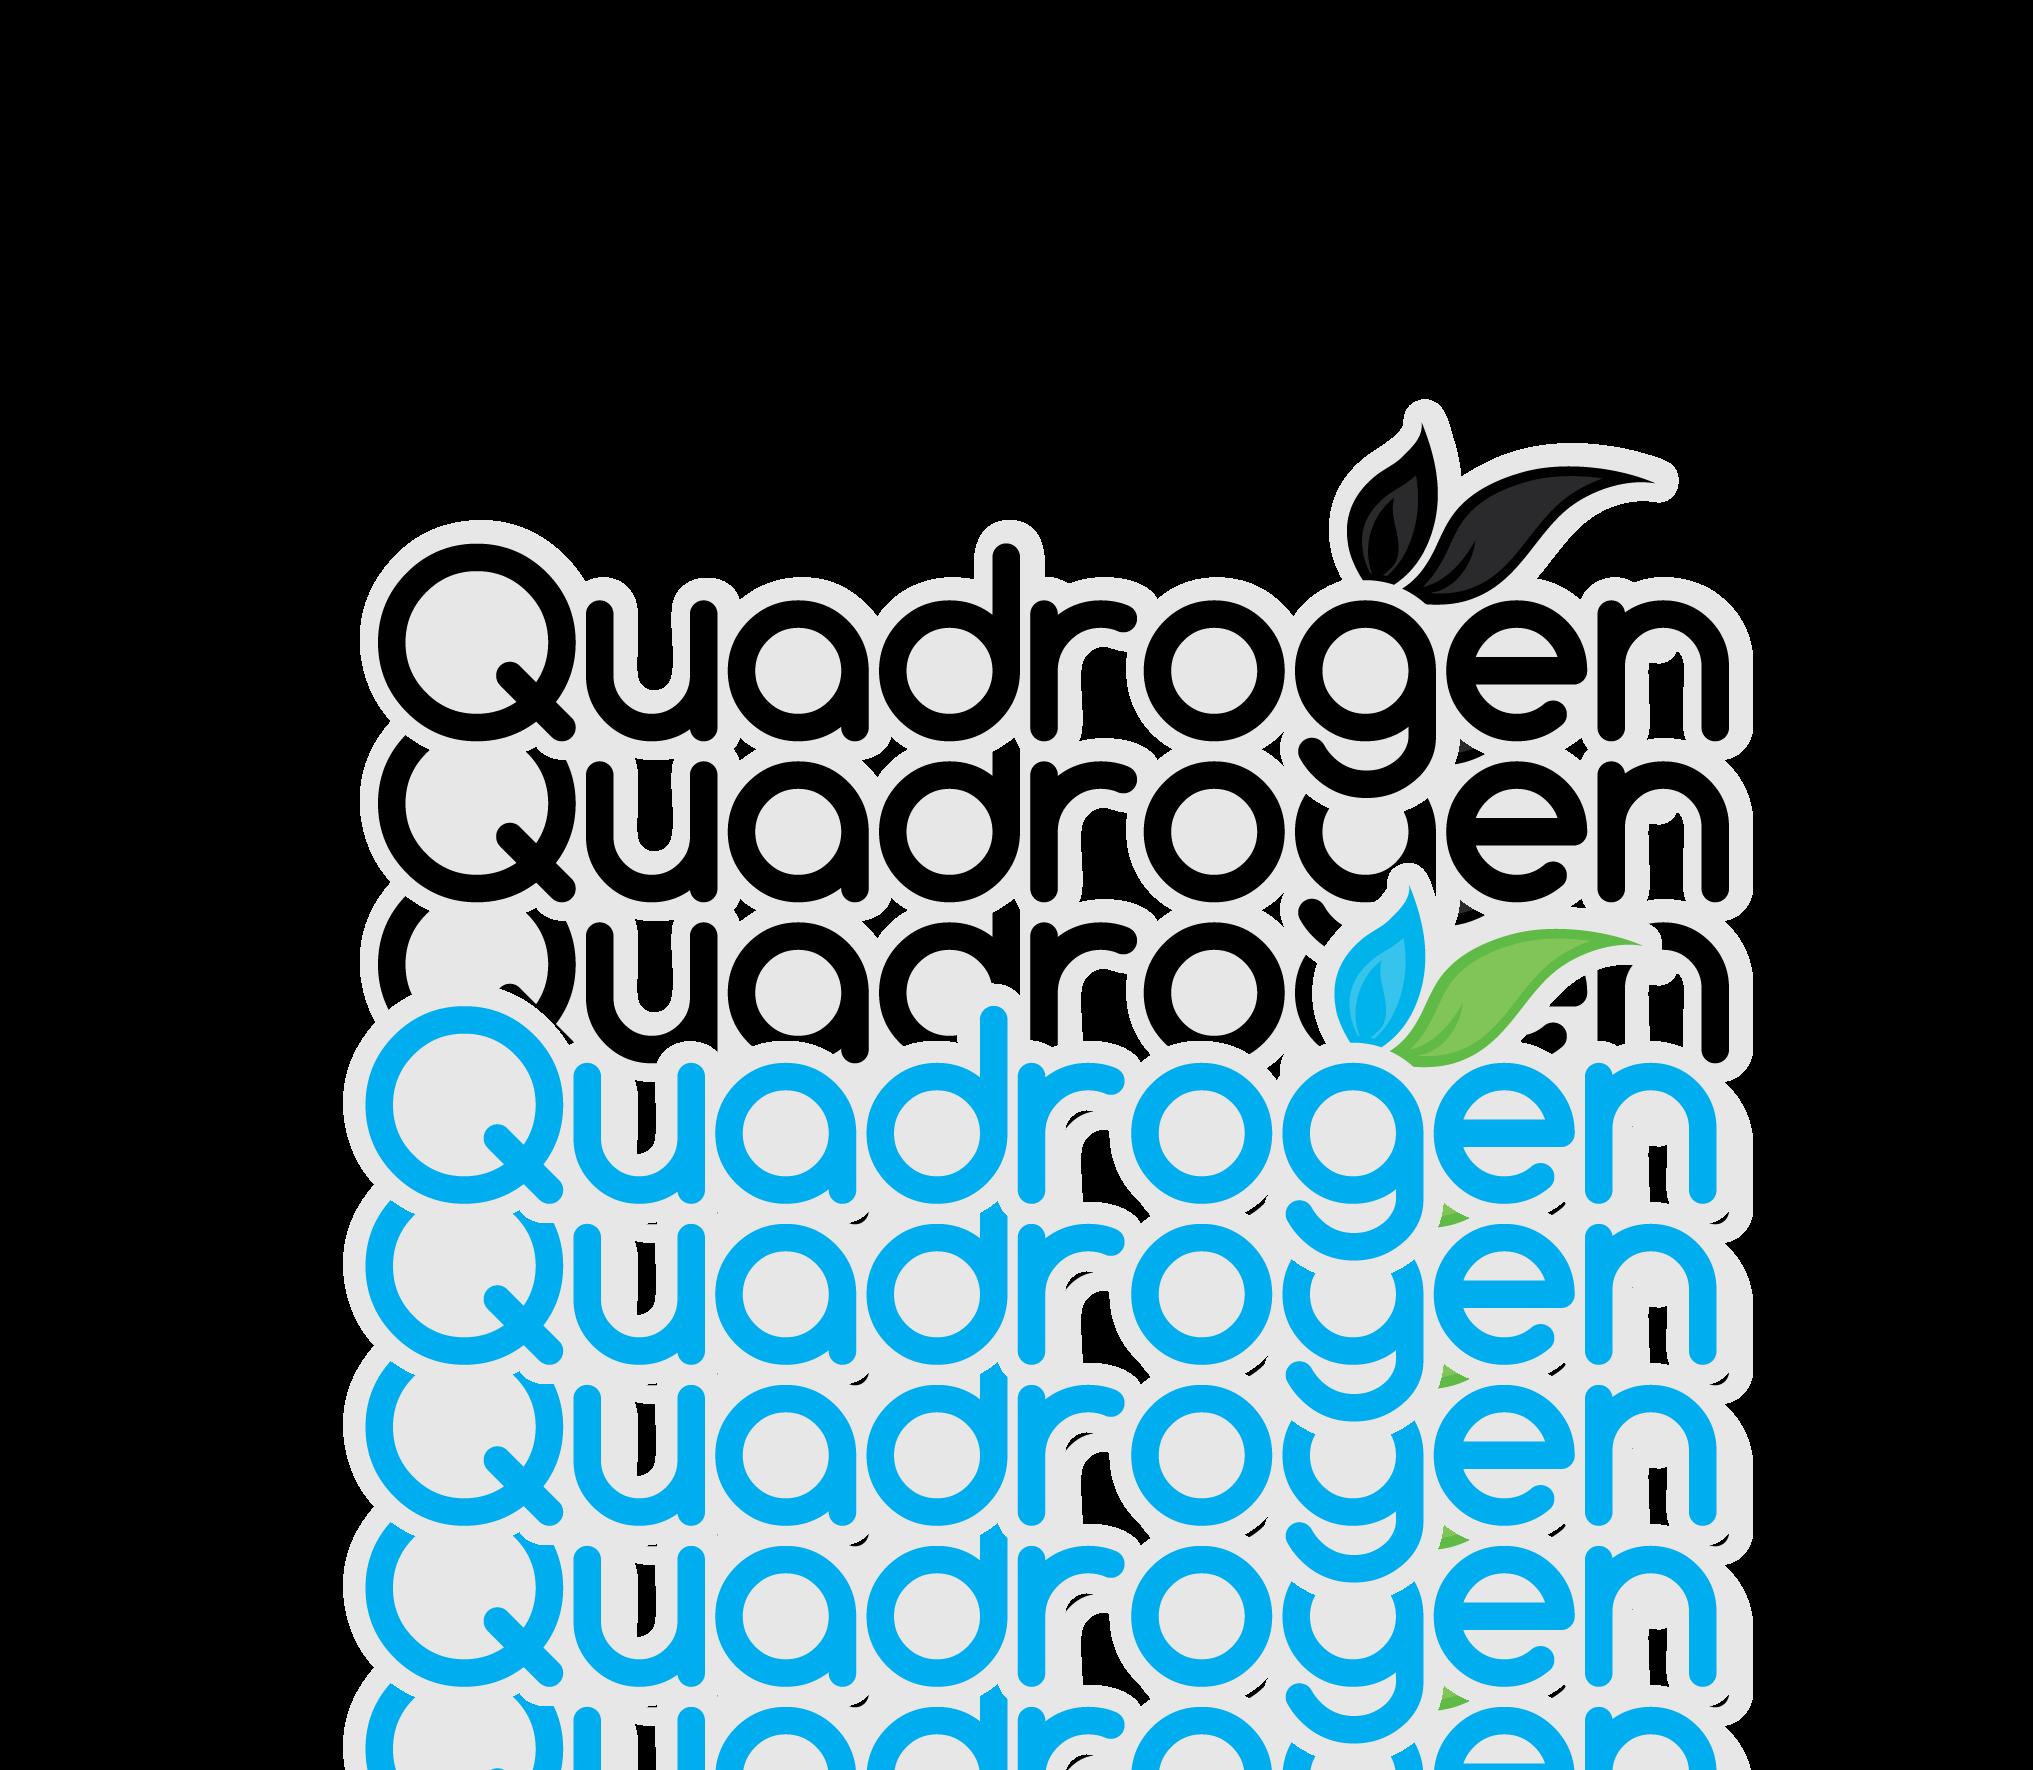 Logo Design by 354studio - Entry No. 153 in the Logo Design Contest New Logo Design for Quadrogen Power Systems, Inc.